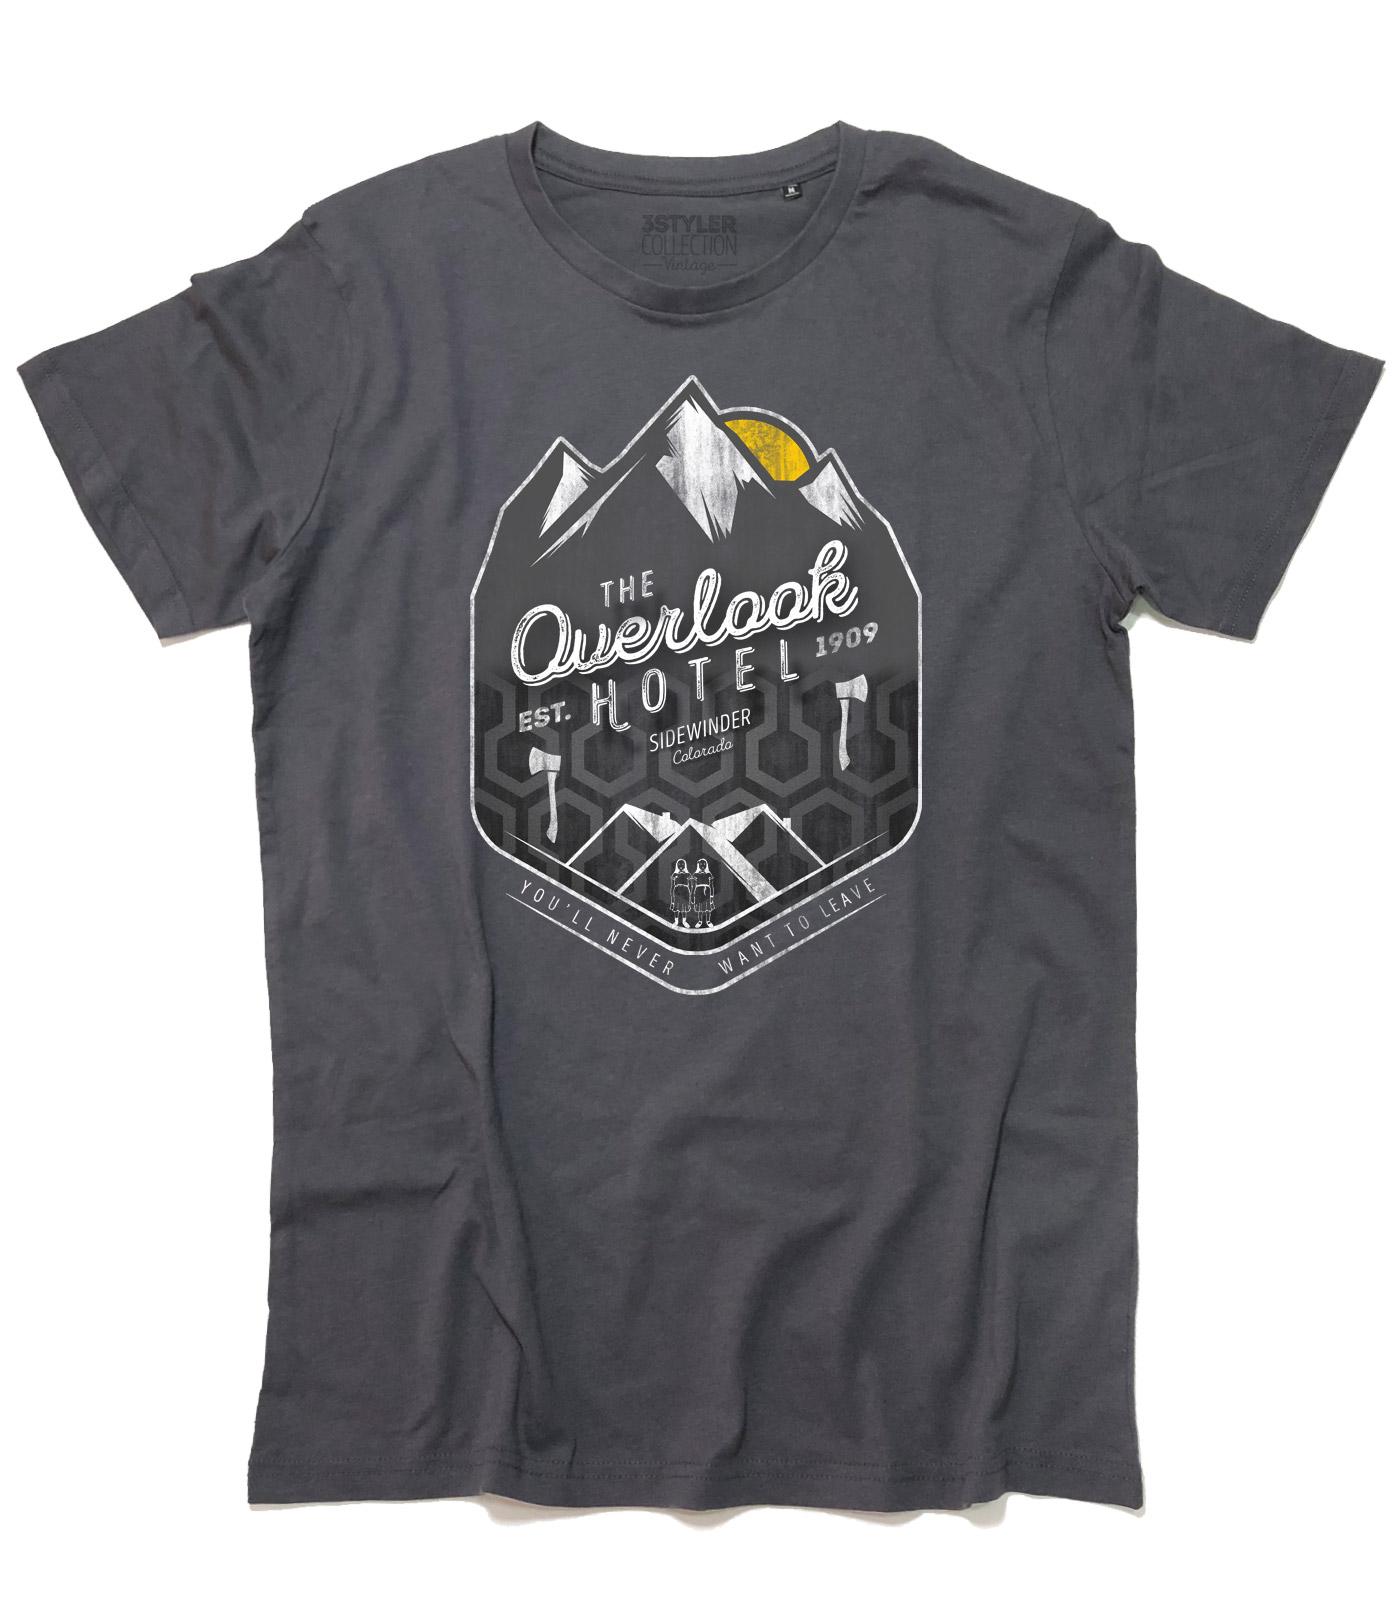 T-shirt donna Qualcuno volò sul nido del cuculo Cuckoo/'s Nest Jack Nicholson